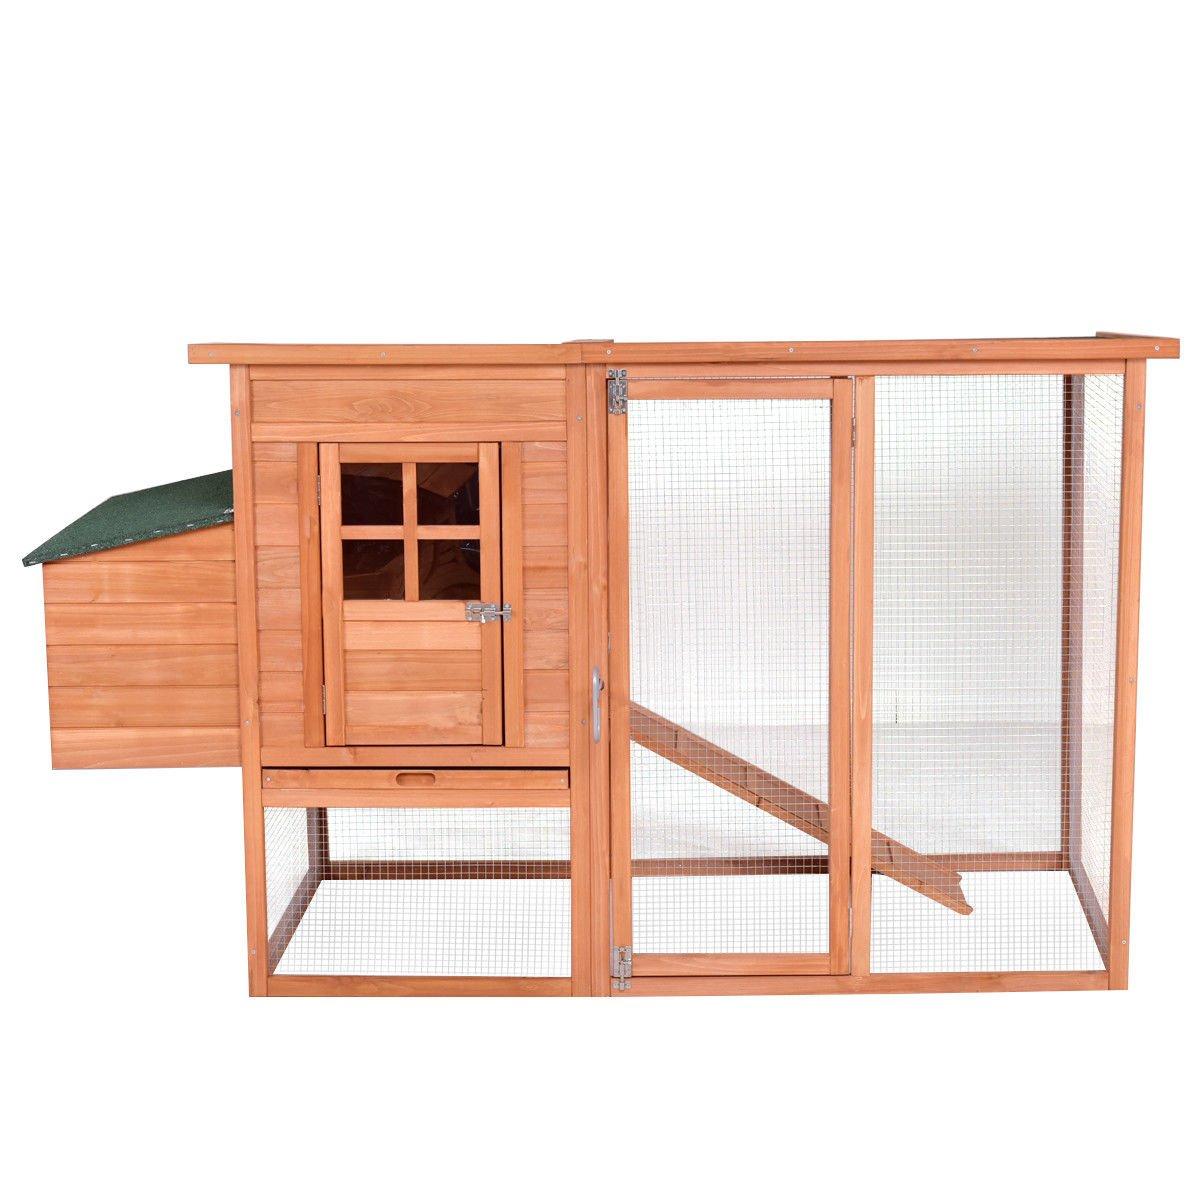 Tangkula Chicken Coop 68'' Rabbit Hutch Wooden Garden Backyard Bunny Hen Small Animal Cage Nest Box with Run